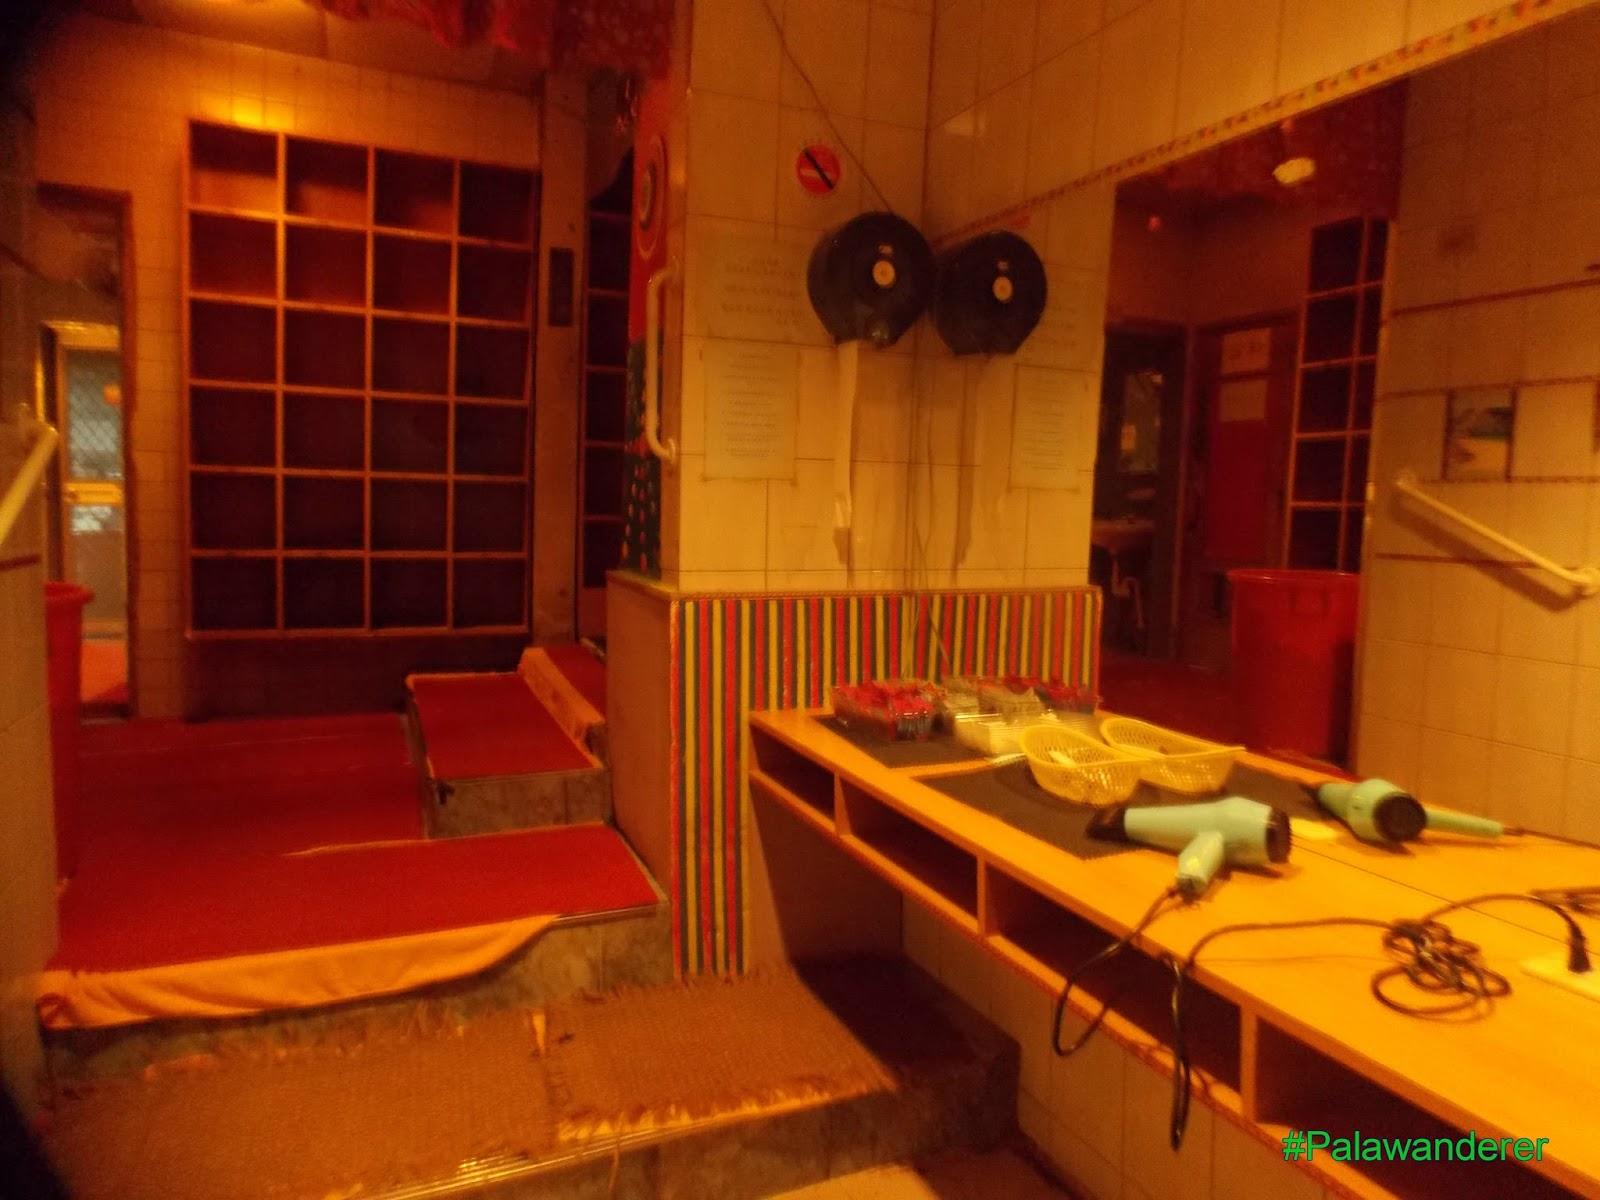 #Palawanderer: Da Shanghai Sauna, gay friendly spa place